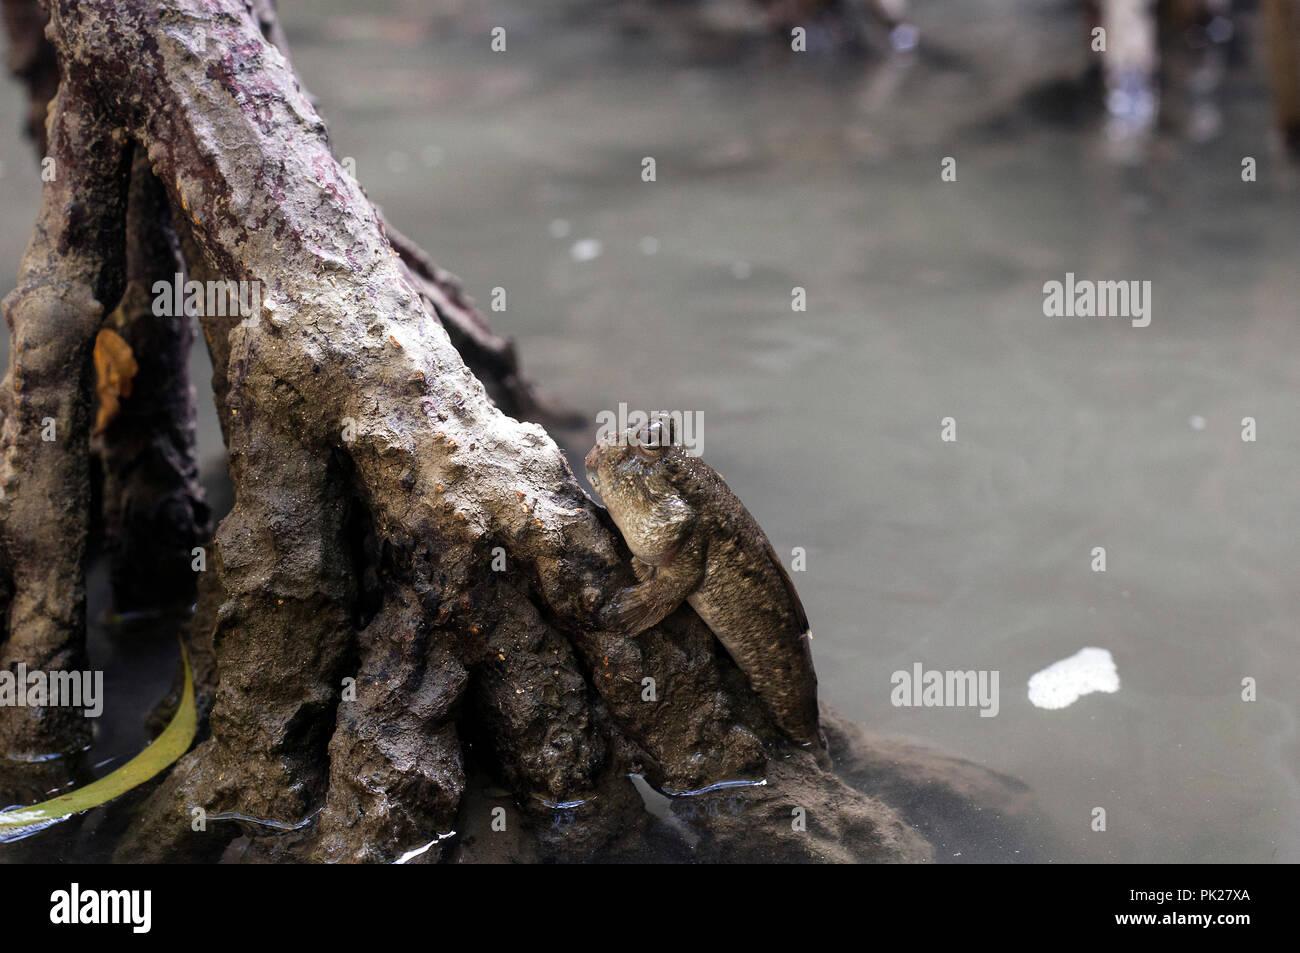 Mudskipper amphibious lungfish fish in mangrove forest - Stock Image